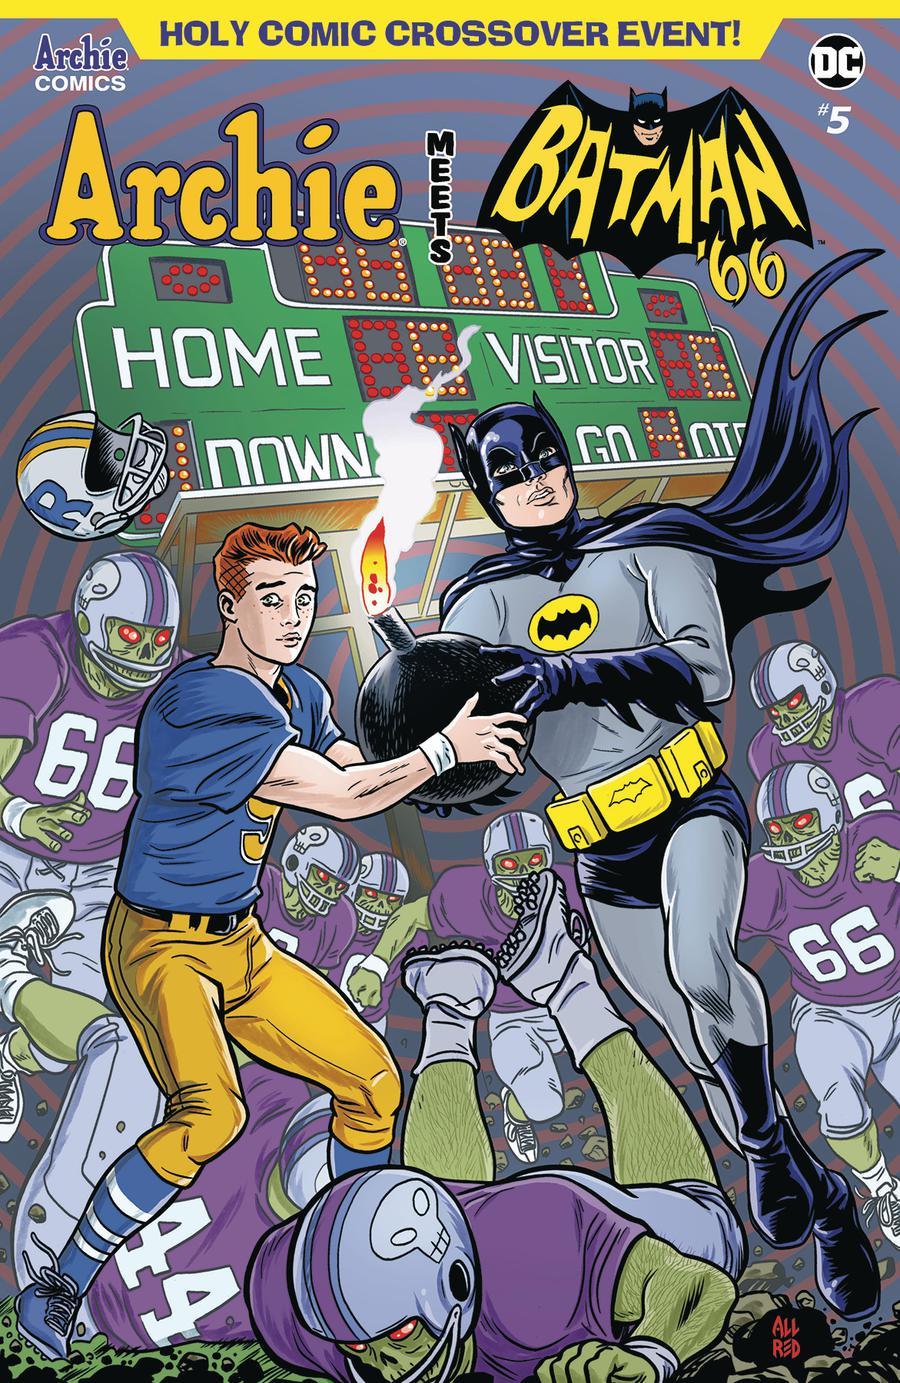 Archie Meets Batman 66 #5 Cover A Regular Michael Allred & Laura Allred Cover